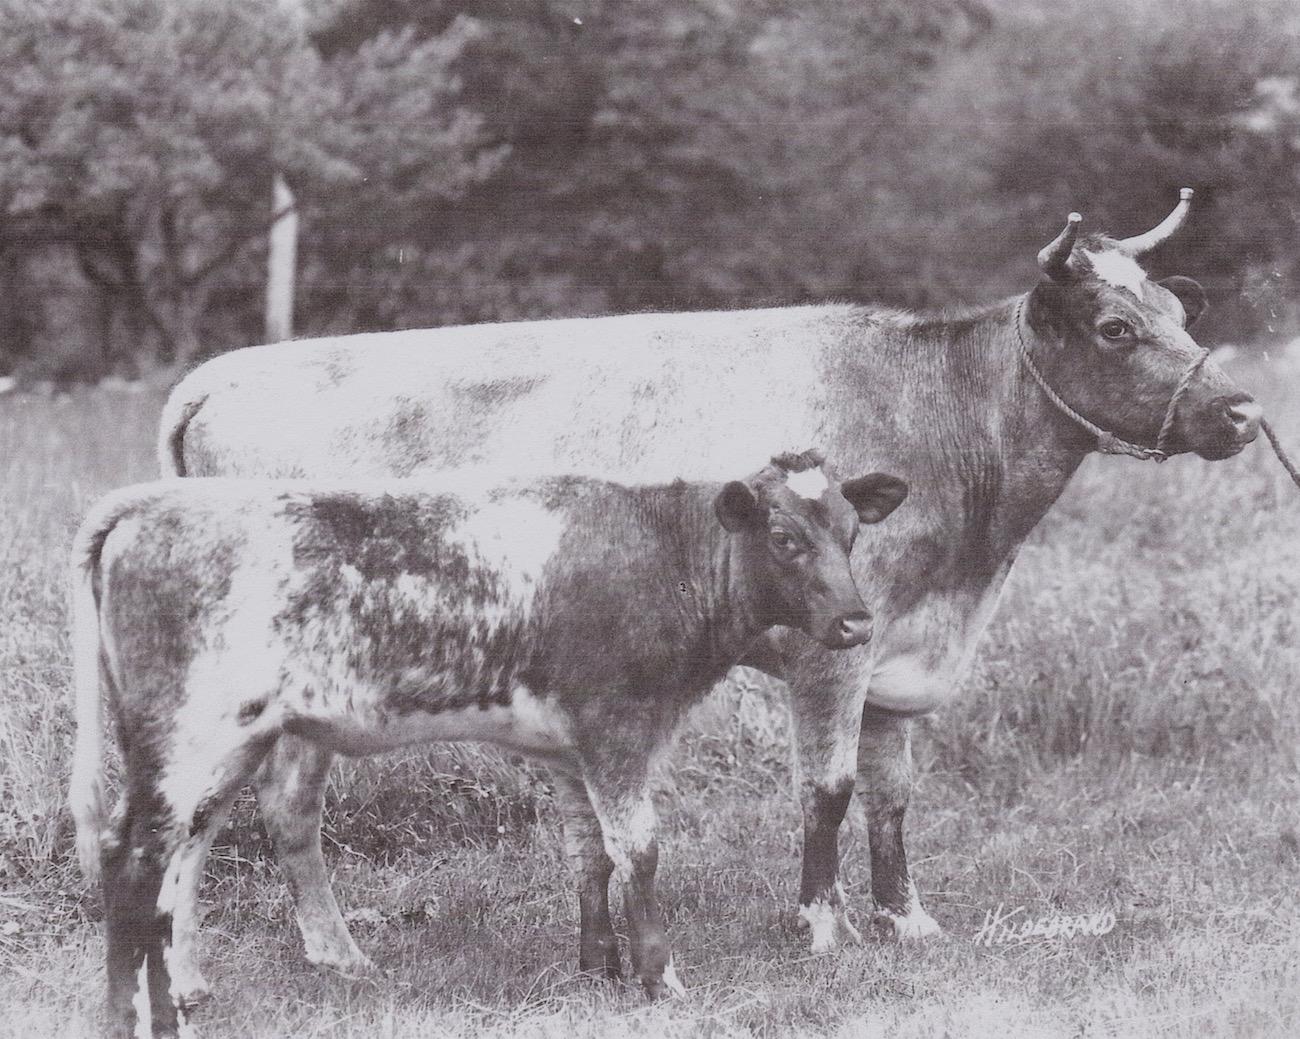 Babraham Rarity, 1910